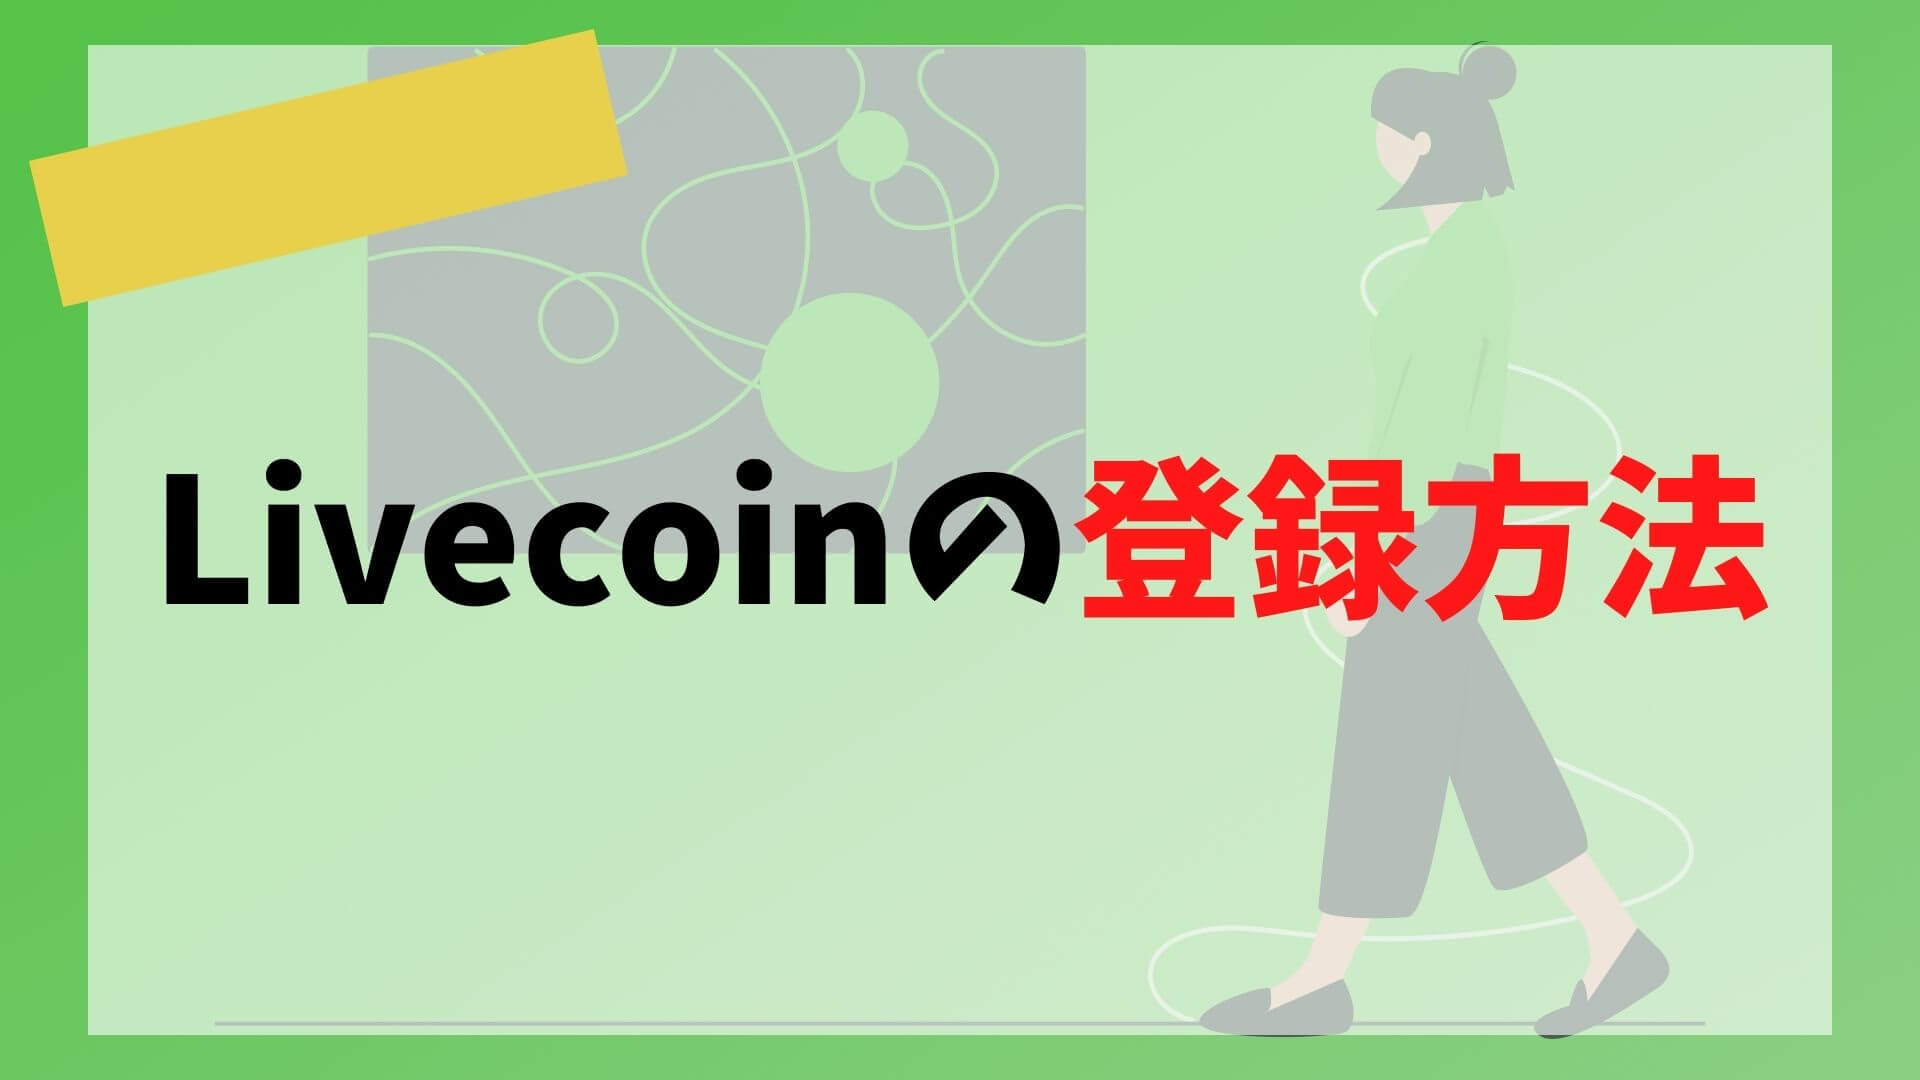 Livecoinの登録方法・口座開設方法